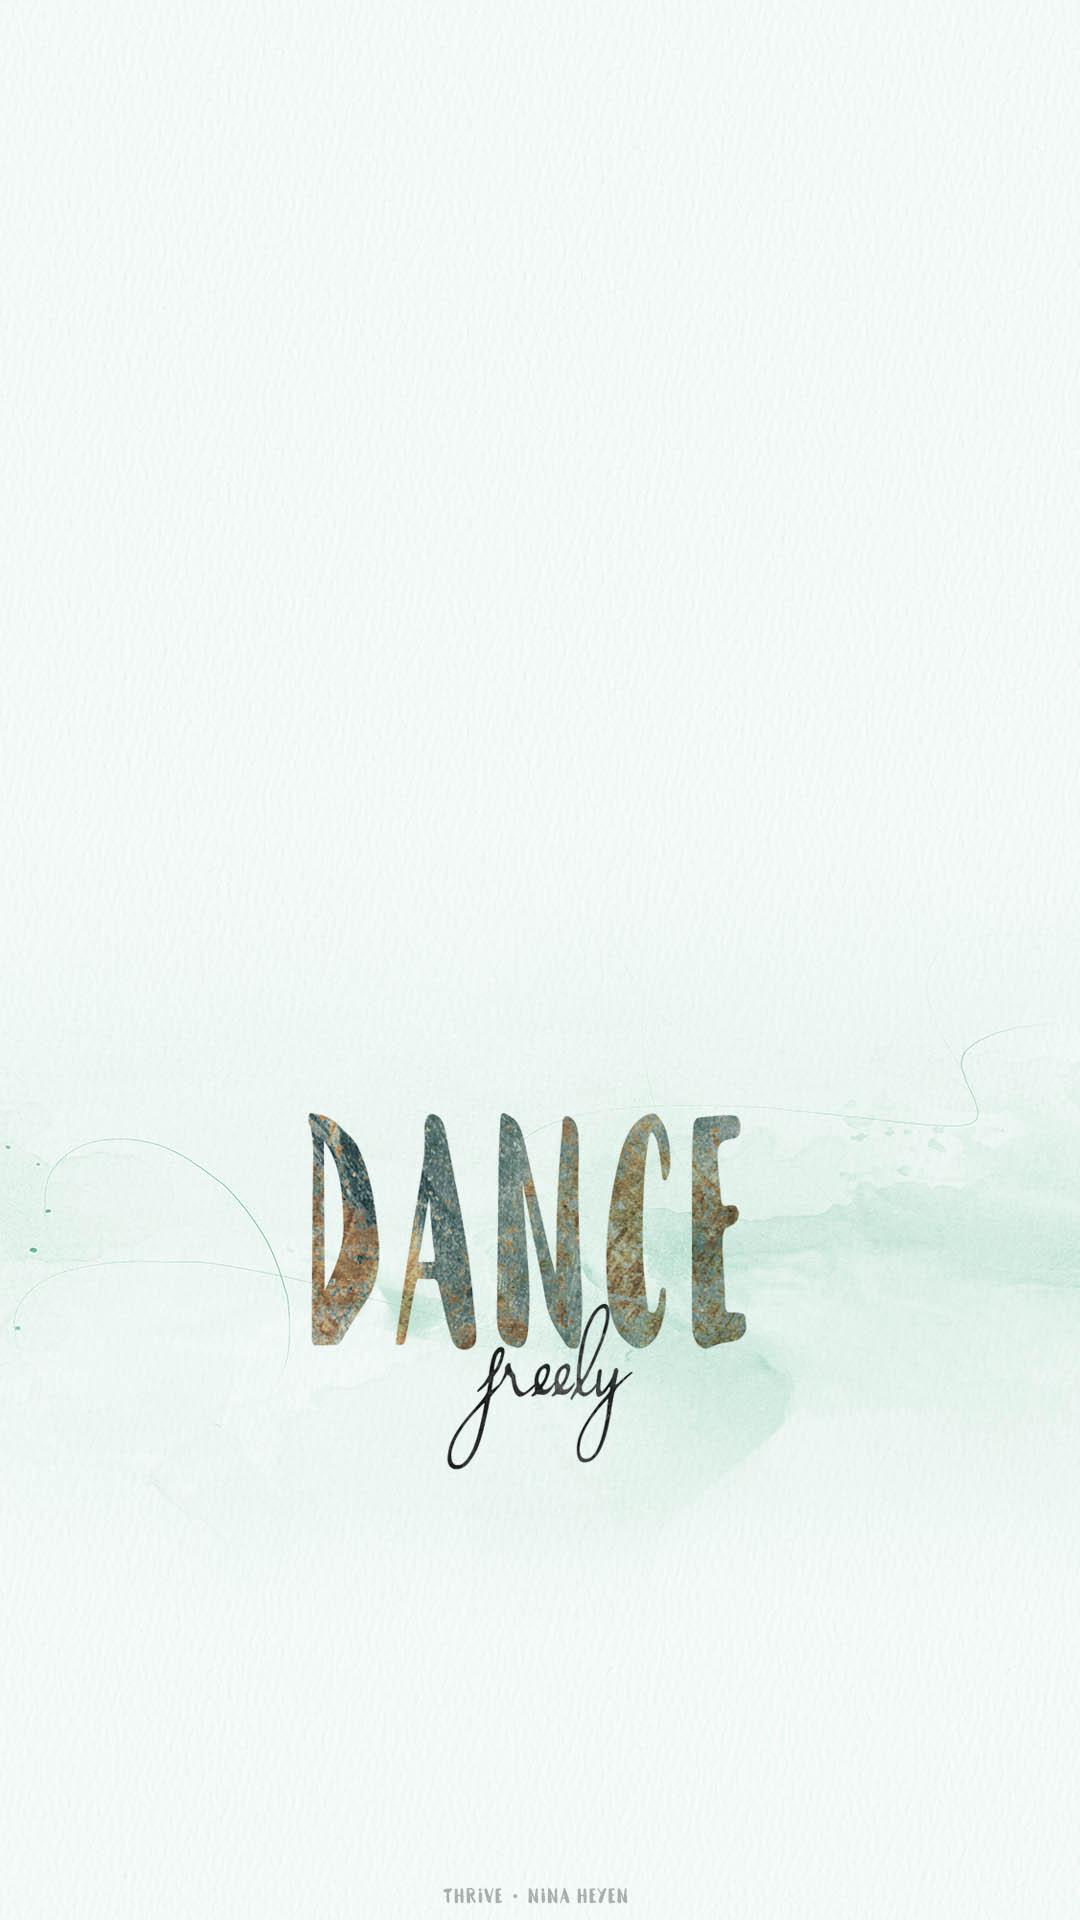 Dance Wallpaper For Phone 2850802 Hd Wallpaper Backgrounds Download